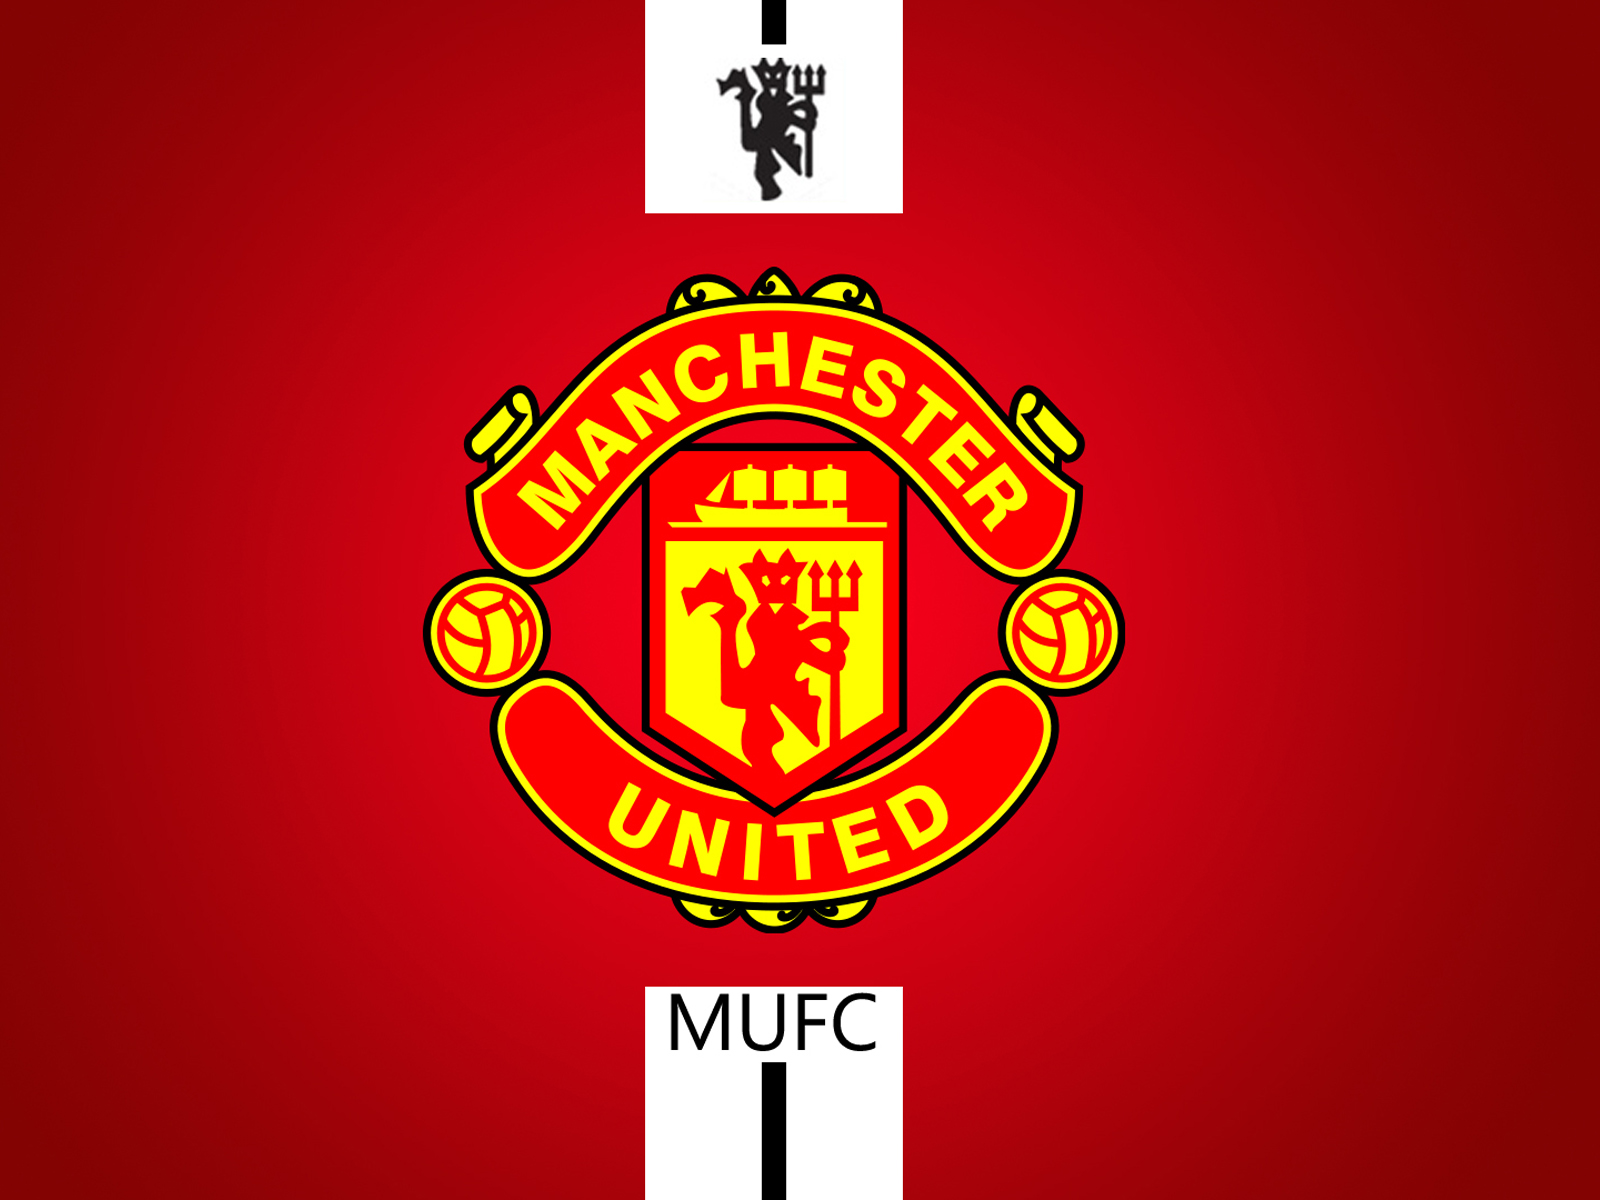 Man utd wallpaper hd wallpapersafari - Manchester united latest wallpapers hd ...